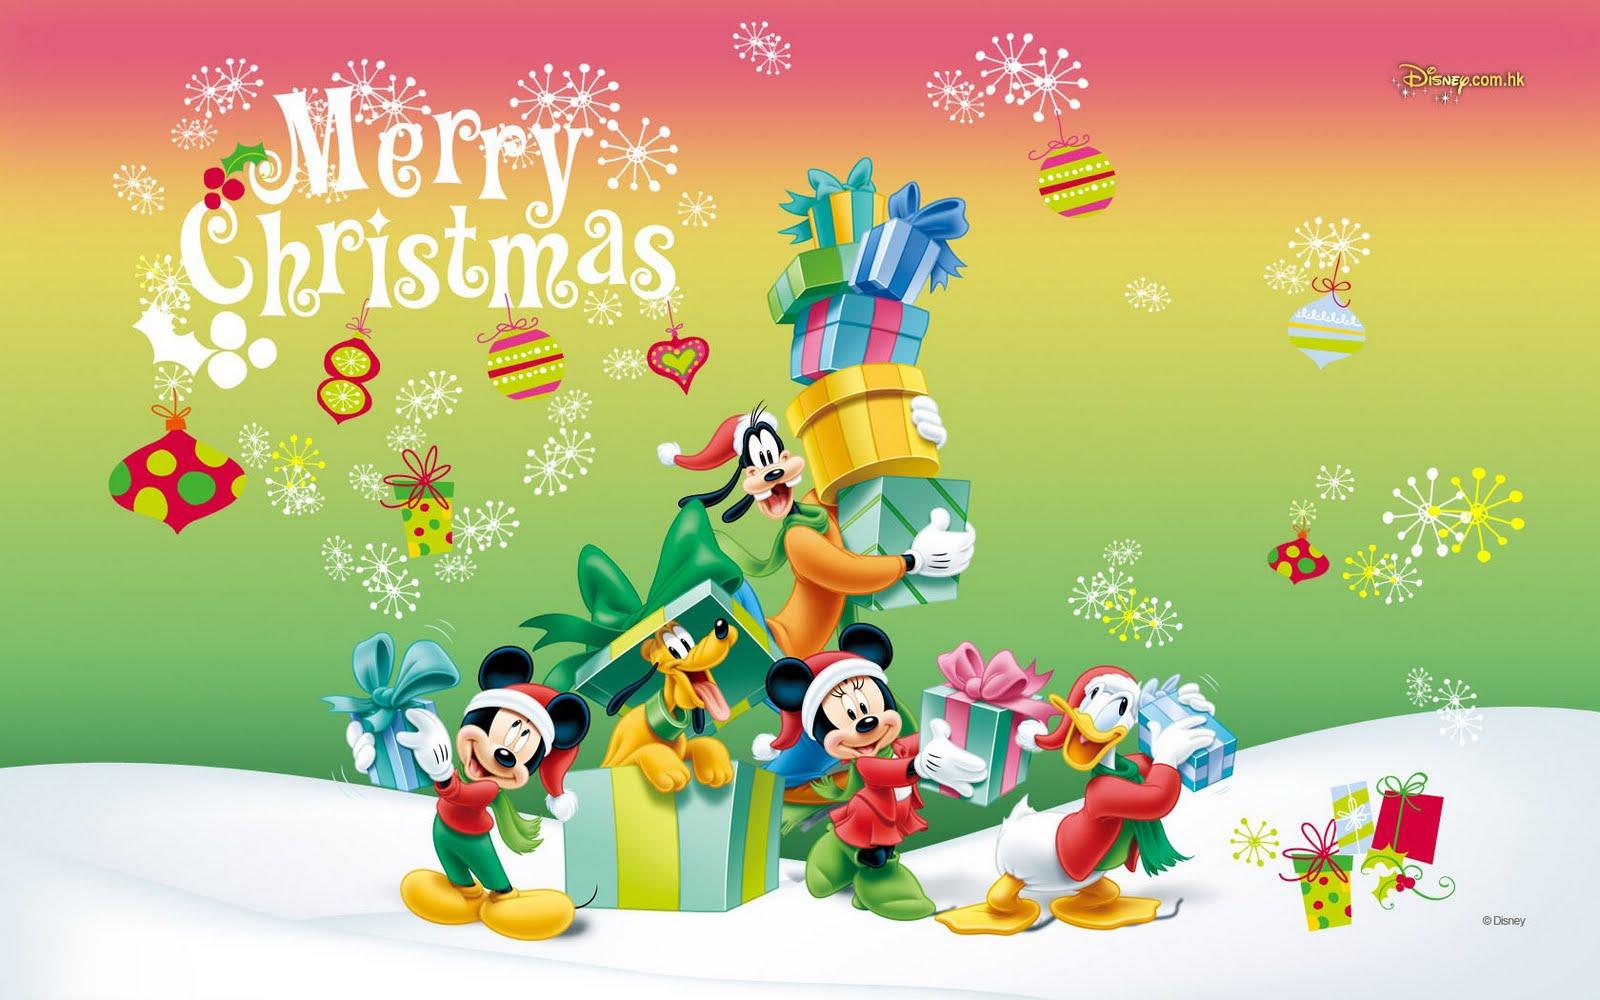 http://3.bp.blogspot.com/-1BSaZvquzyE/TpeXK3uenBI/AAAAAAAAAPY/jqKukmoWu1w/s1600/disney_christmas_wallpaper1.jpg